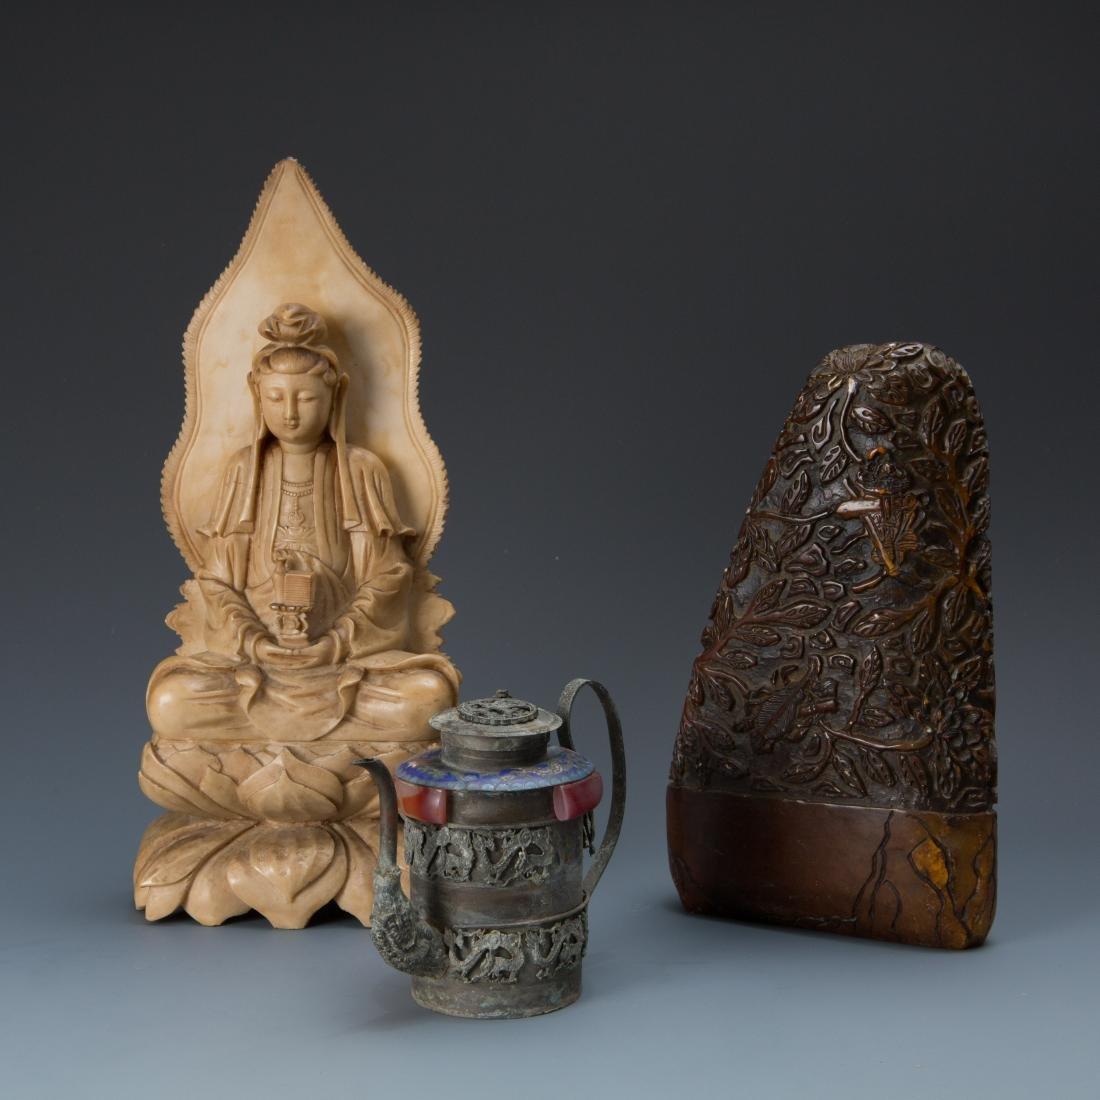 Estate Sale: Carved Guan Yin Brown Stone Tea Pot